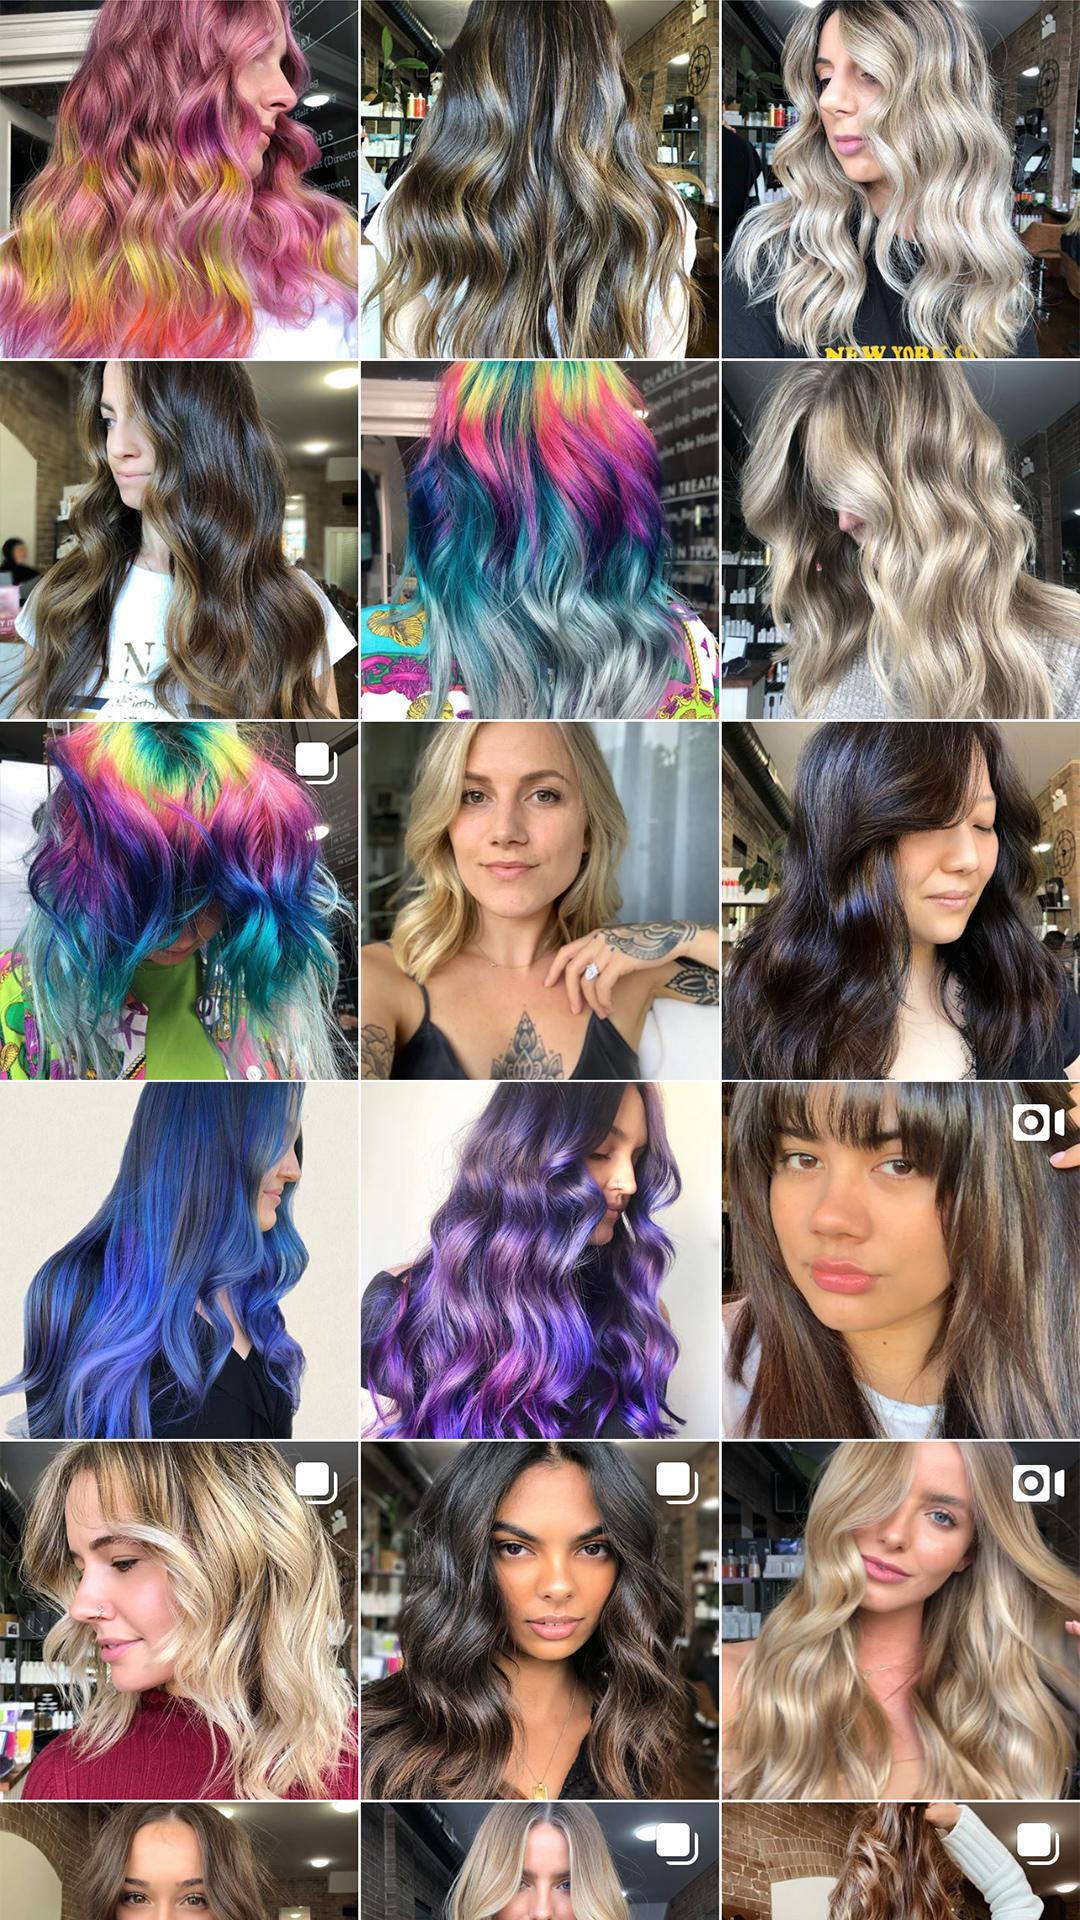 Check out more of Amanda's work on Instagram @amandatua_hair -